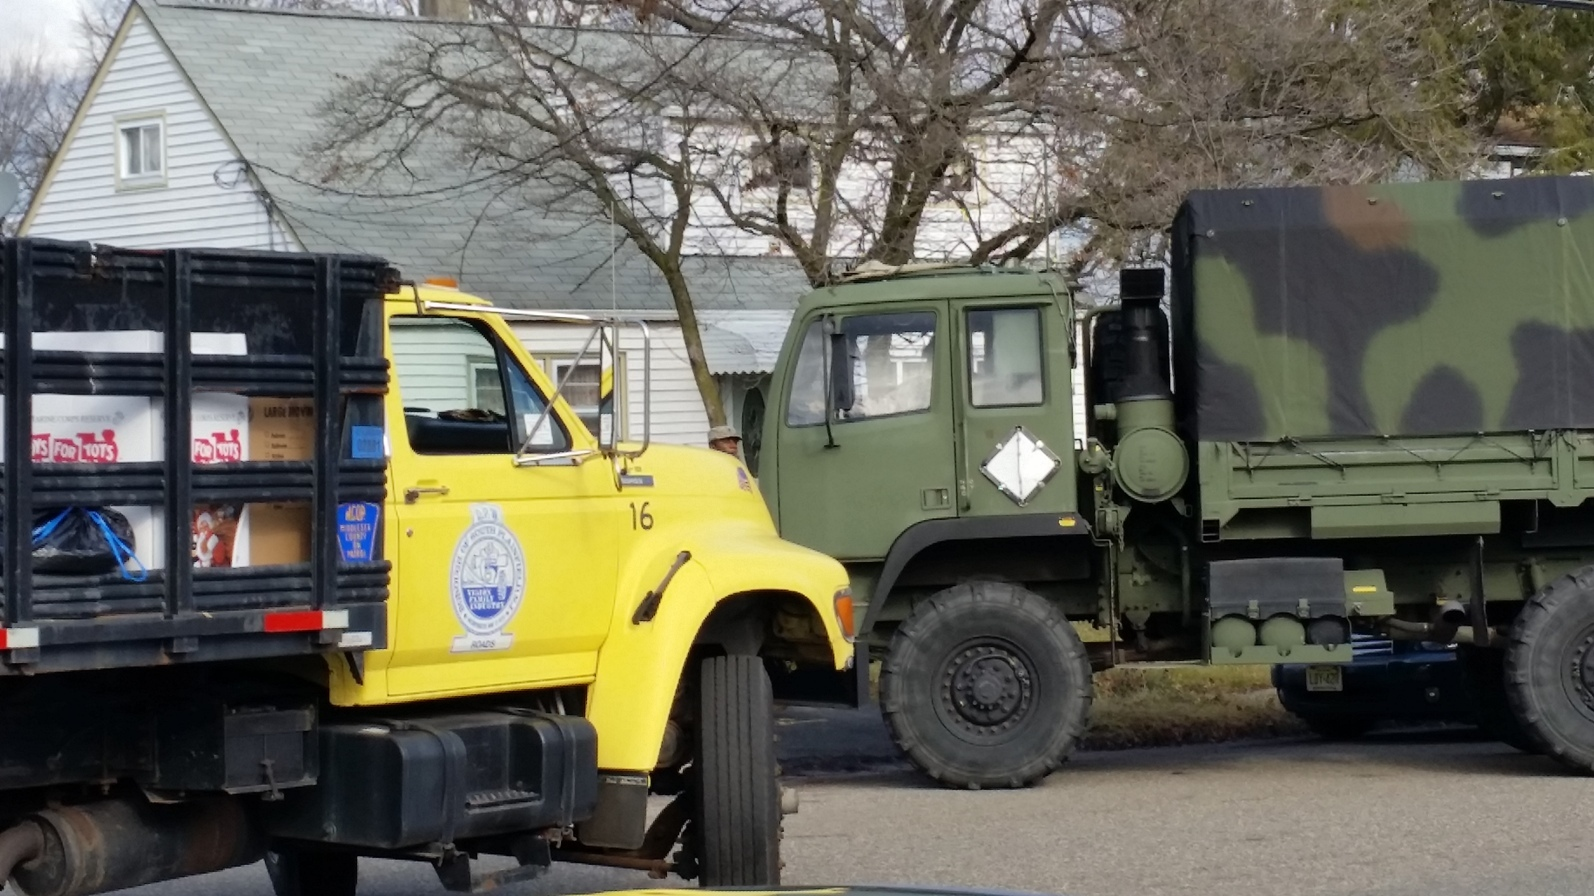 6cb19704c55bce70b749_trucks.jpg